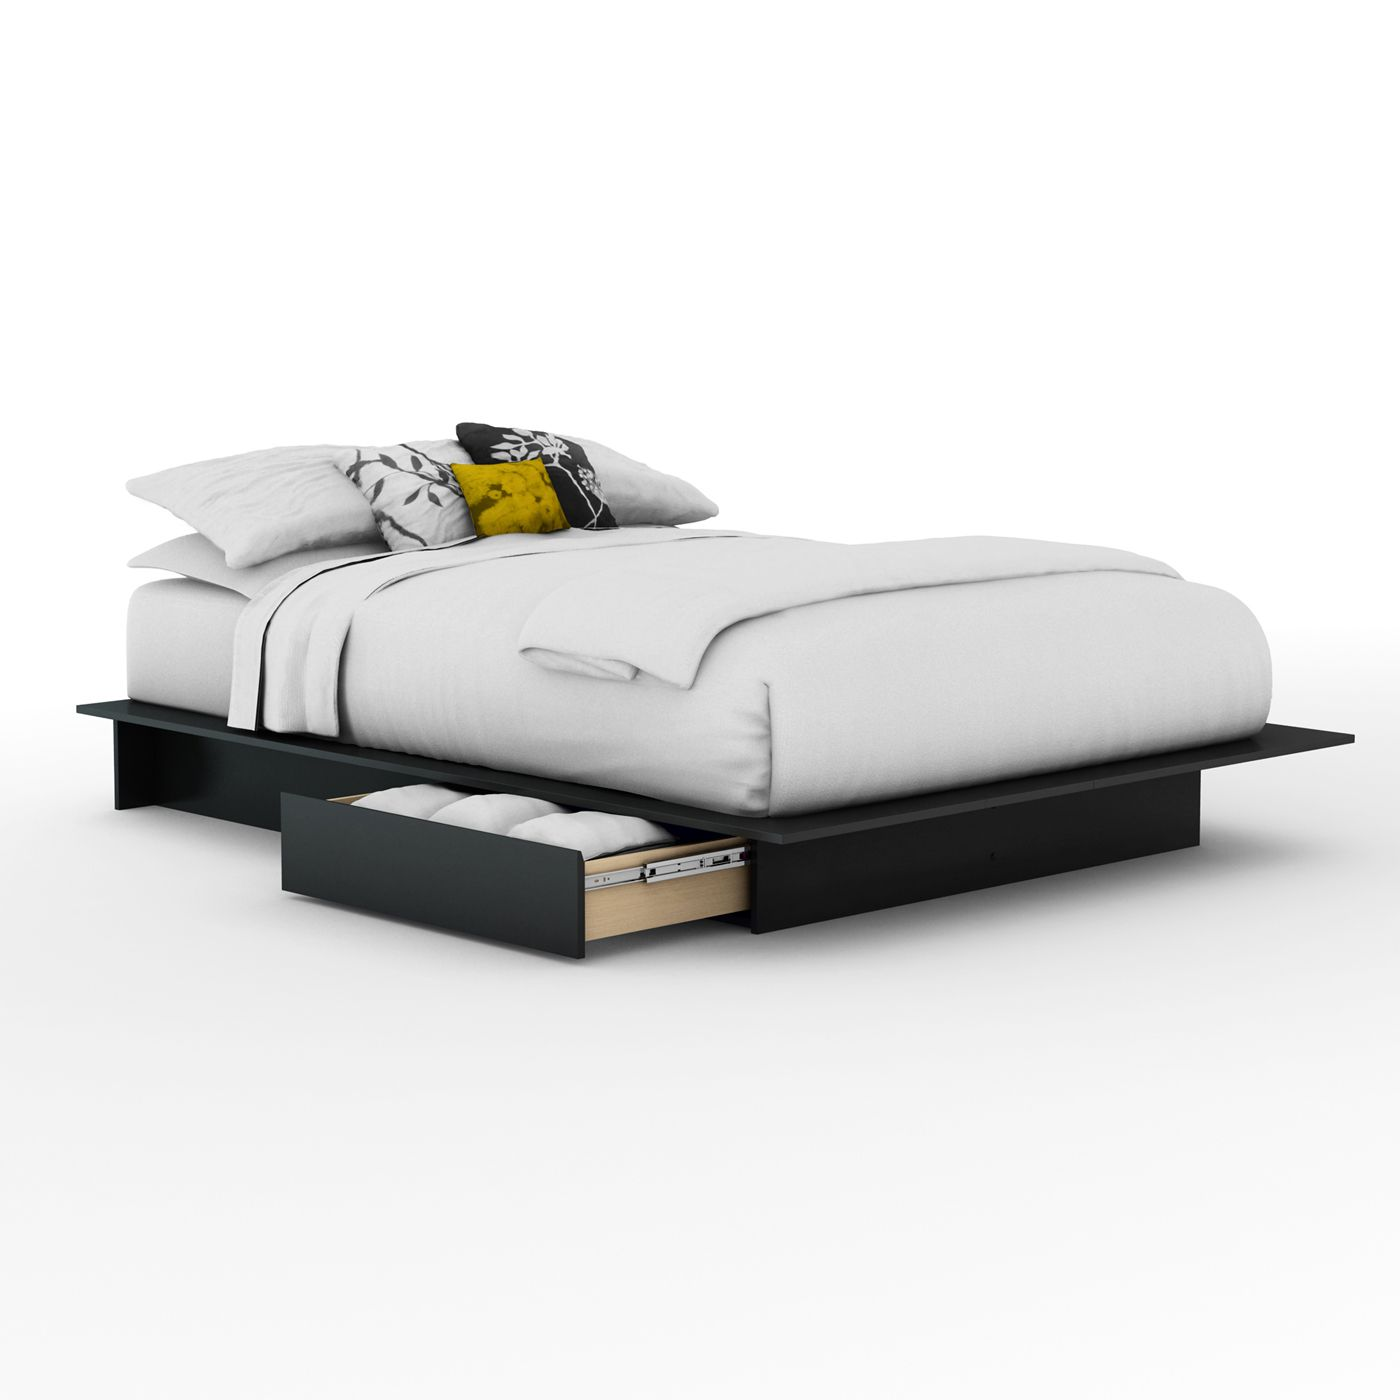 South Shore Furniture Step One Platform Bed With Side Drawers Platform Bed With Drawers Platform Bed With Storage Black Platform Bed